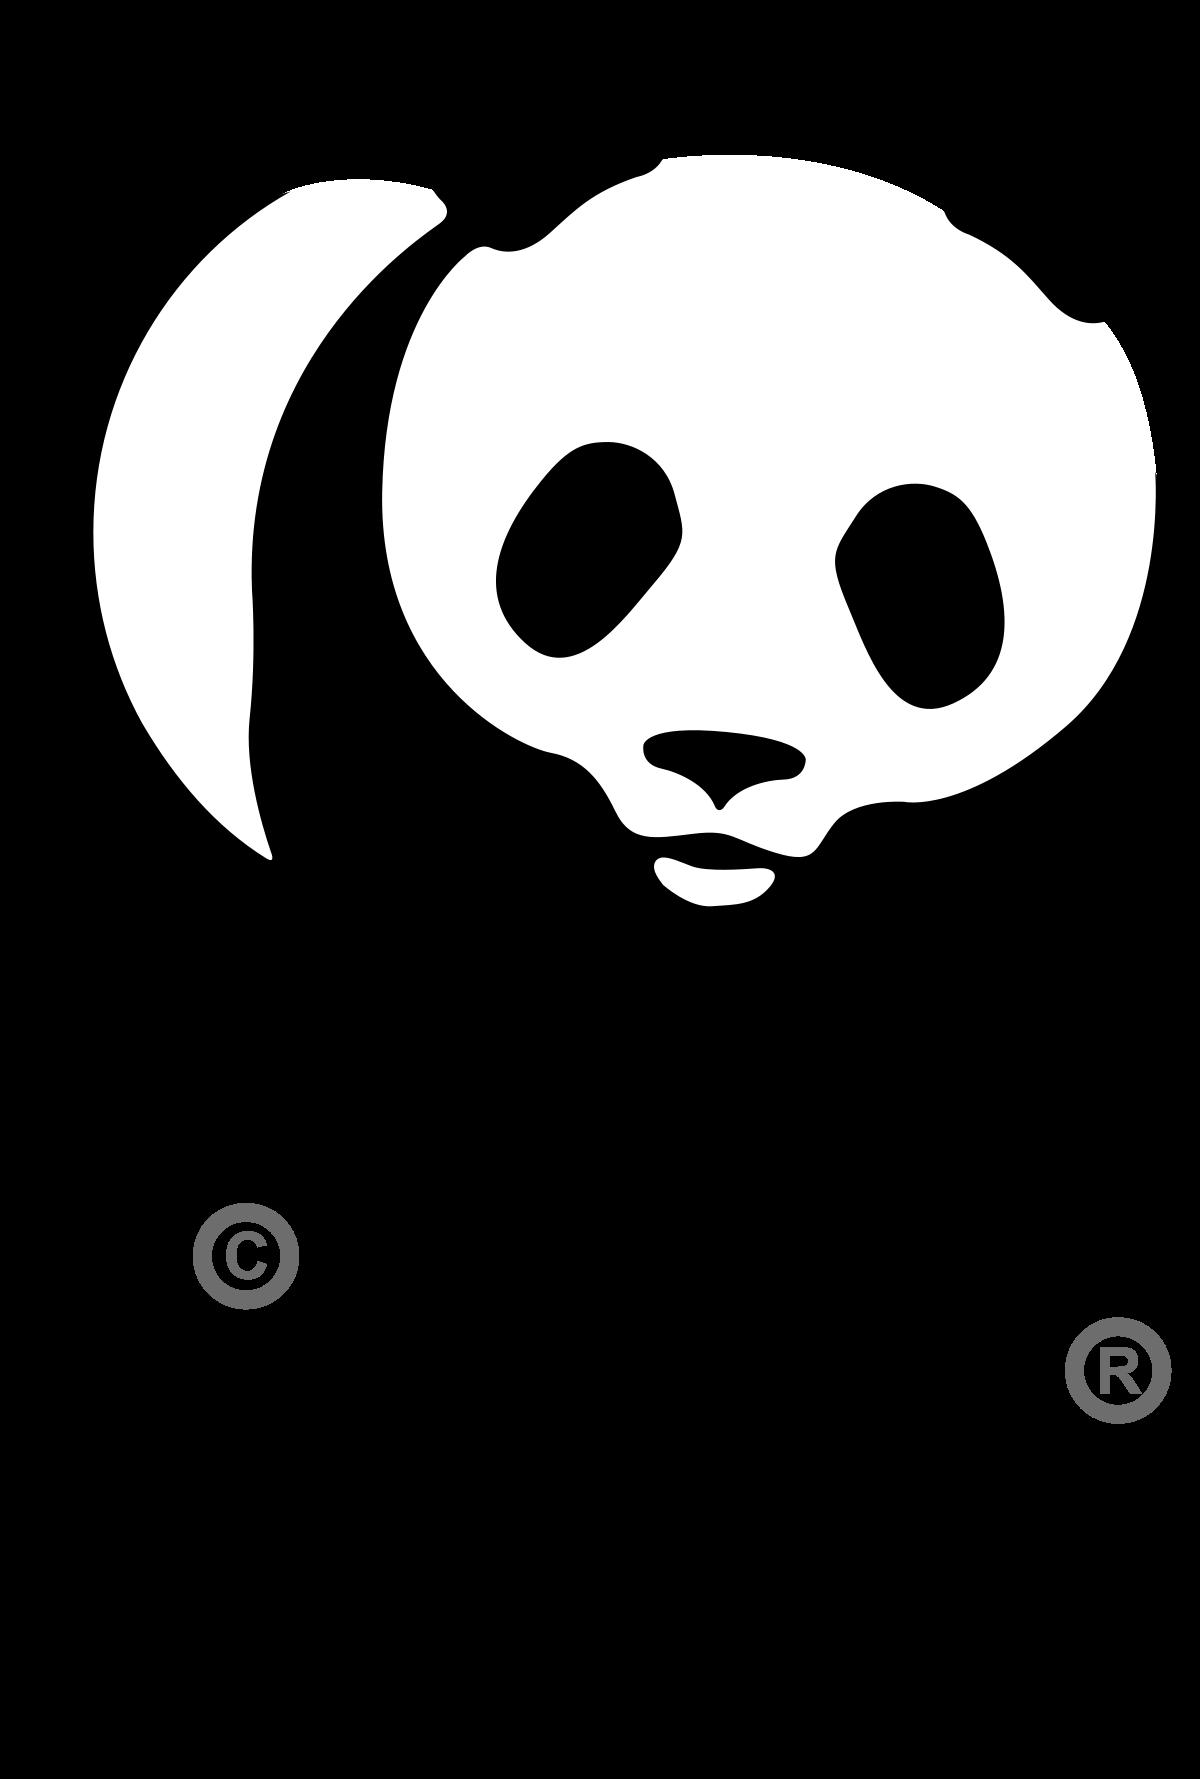 WWF Russia logo